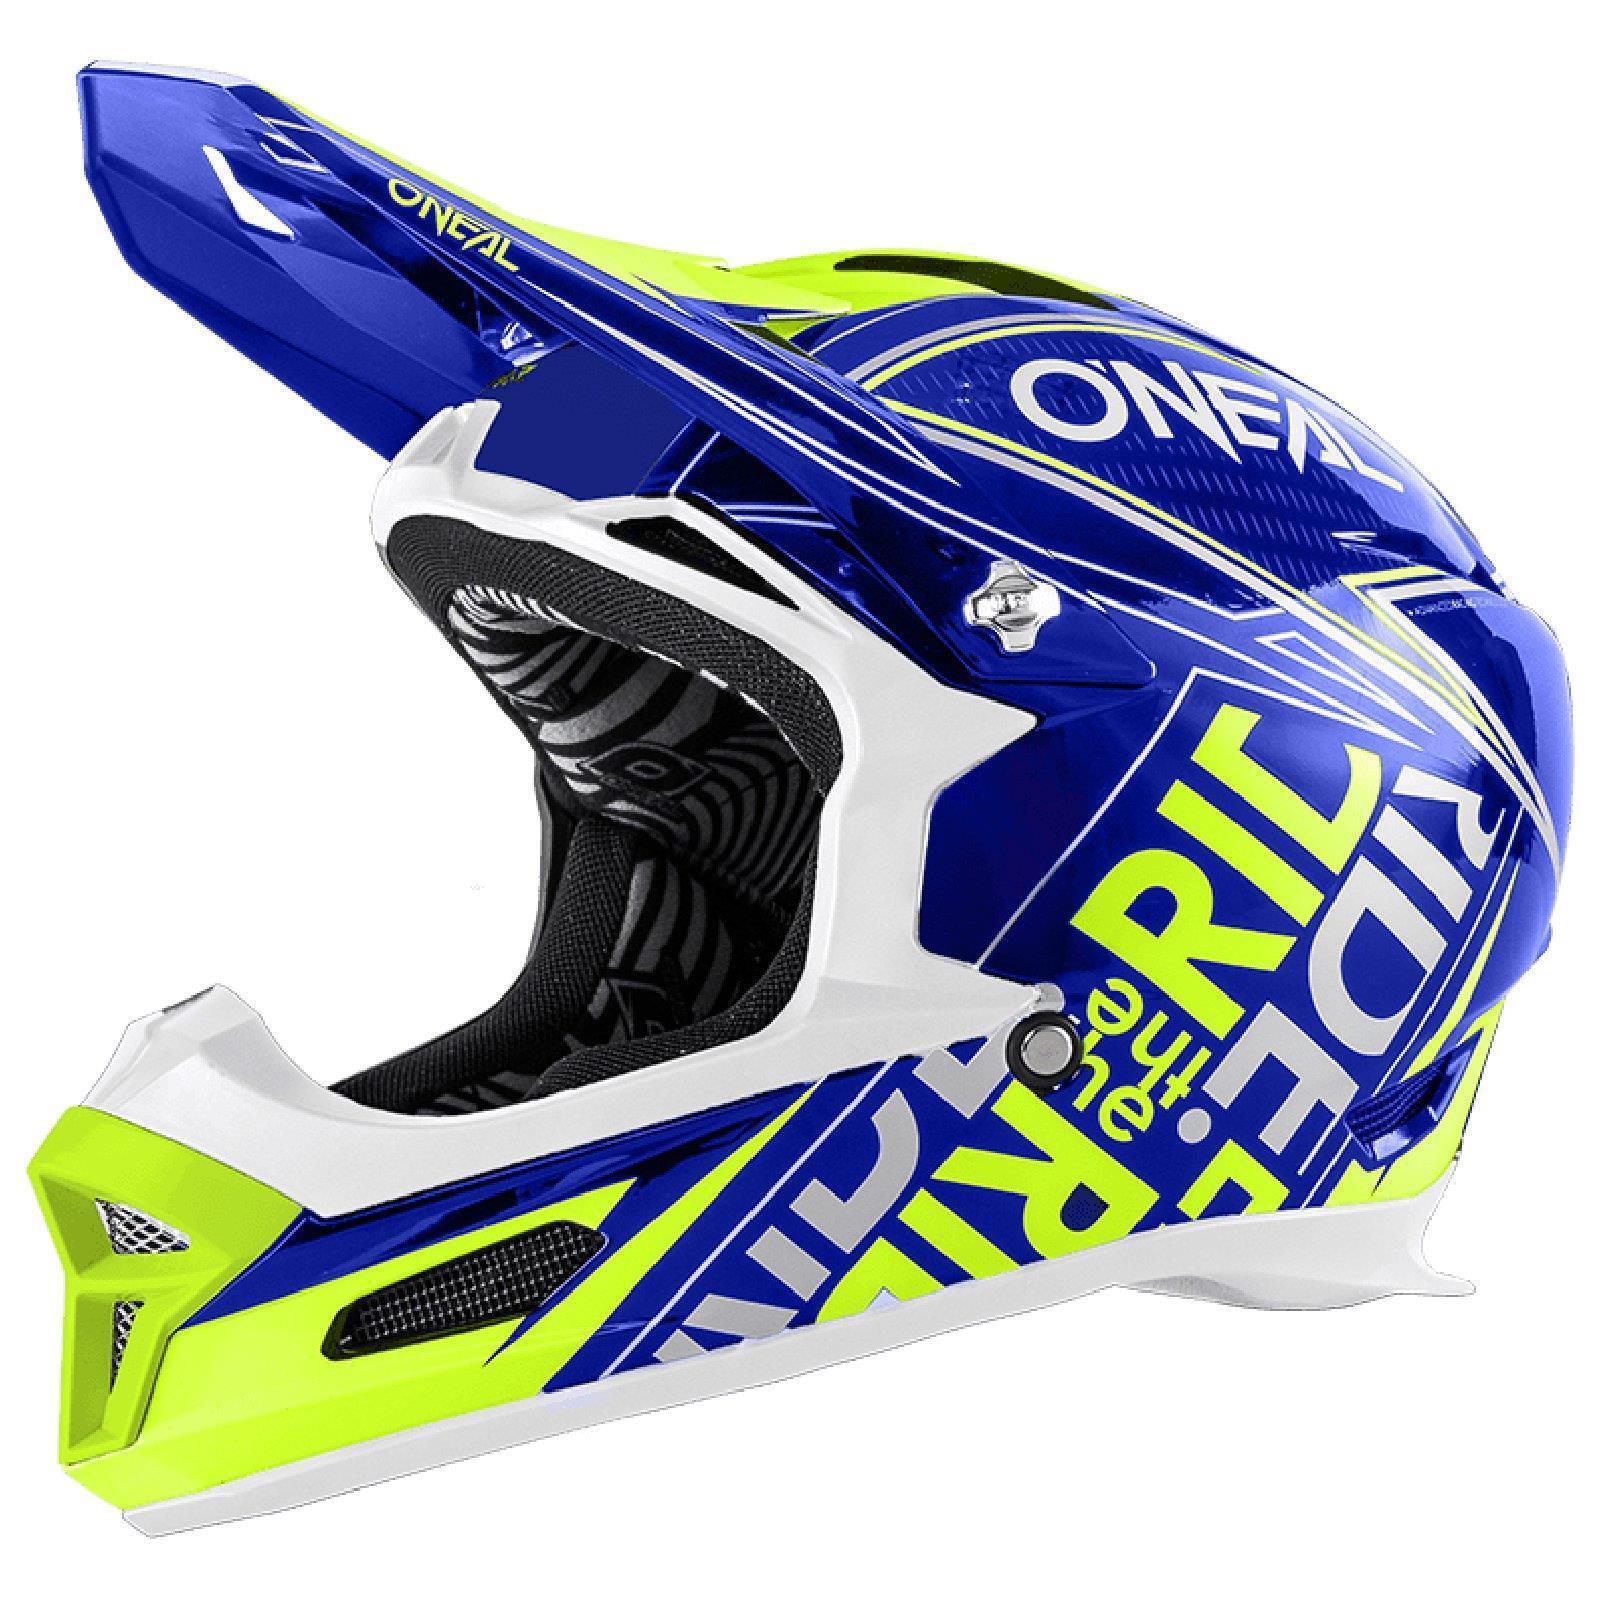 ONeal Fury RL Helm Fuel  blue yellow DH FR MTB Downhill Fahrrad Mountainbike Trail  cheapest price